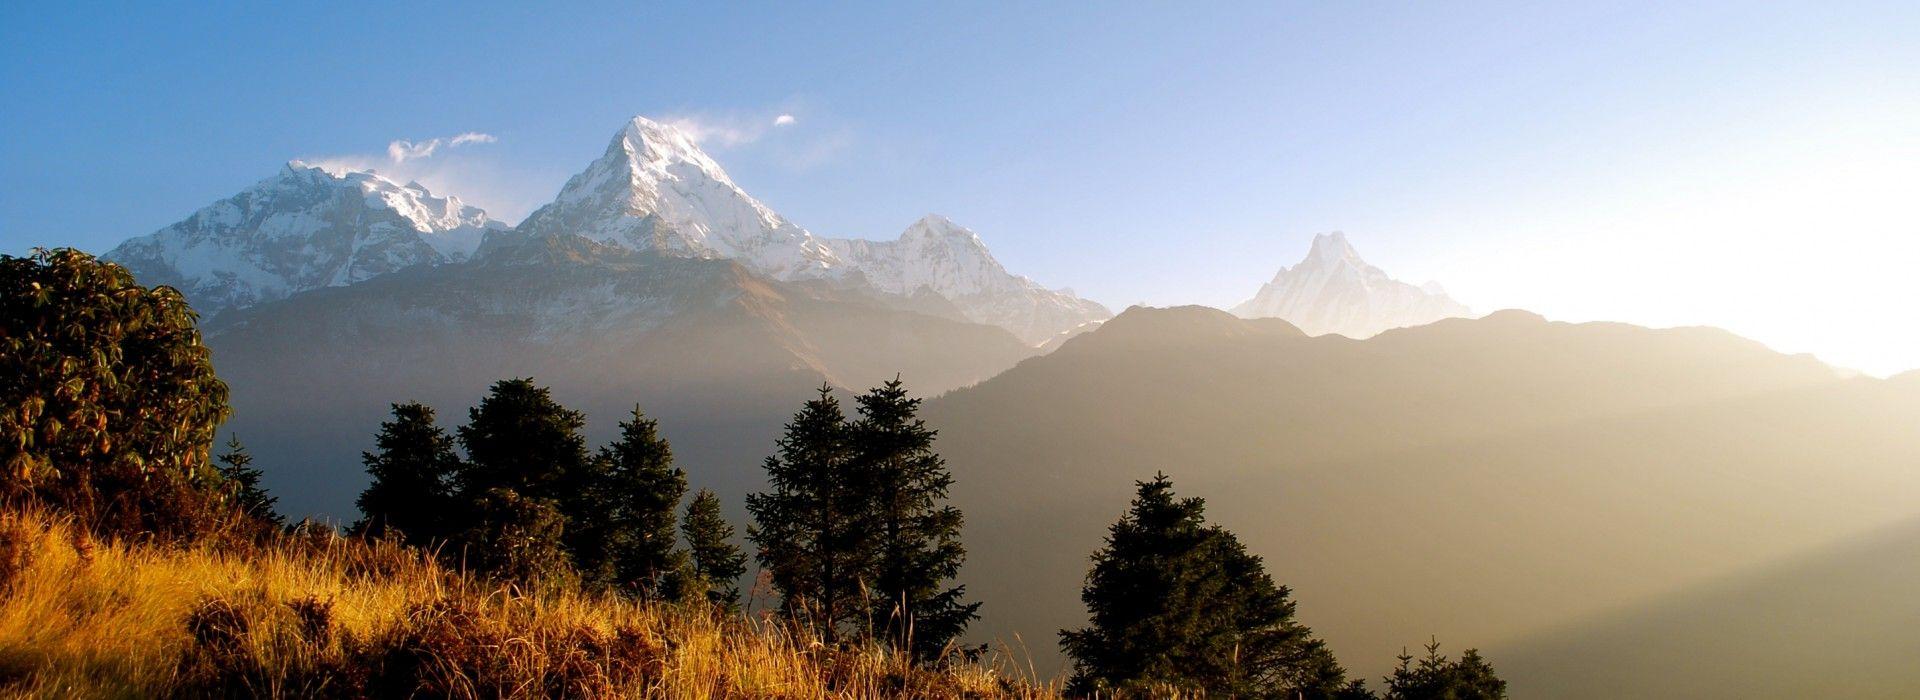 Trekking Tours in Nepal